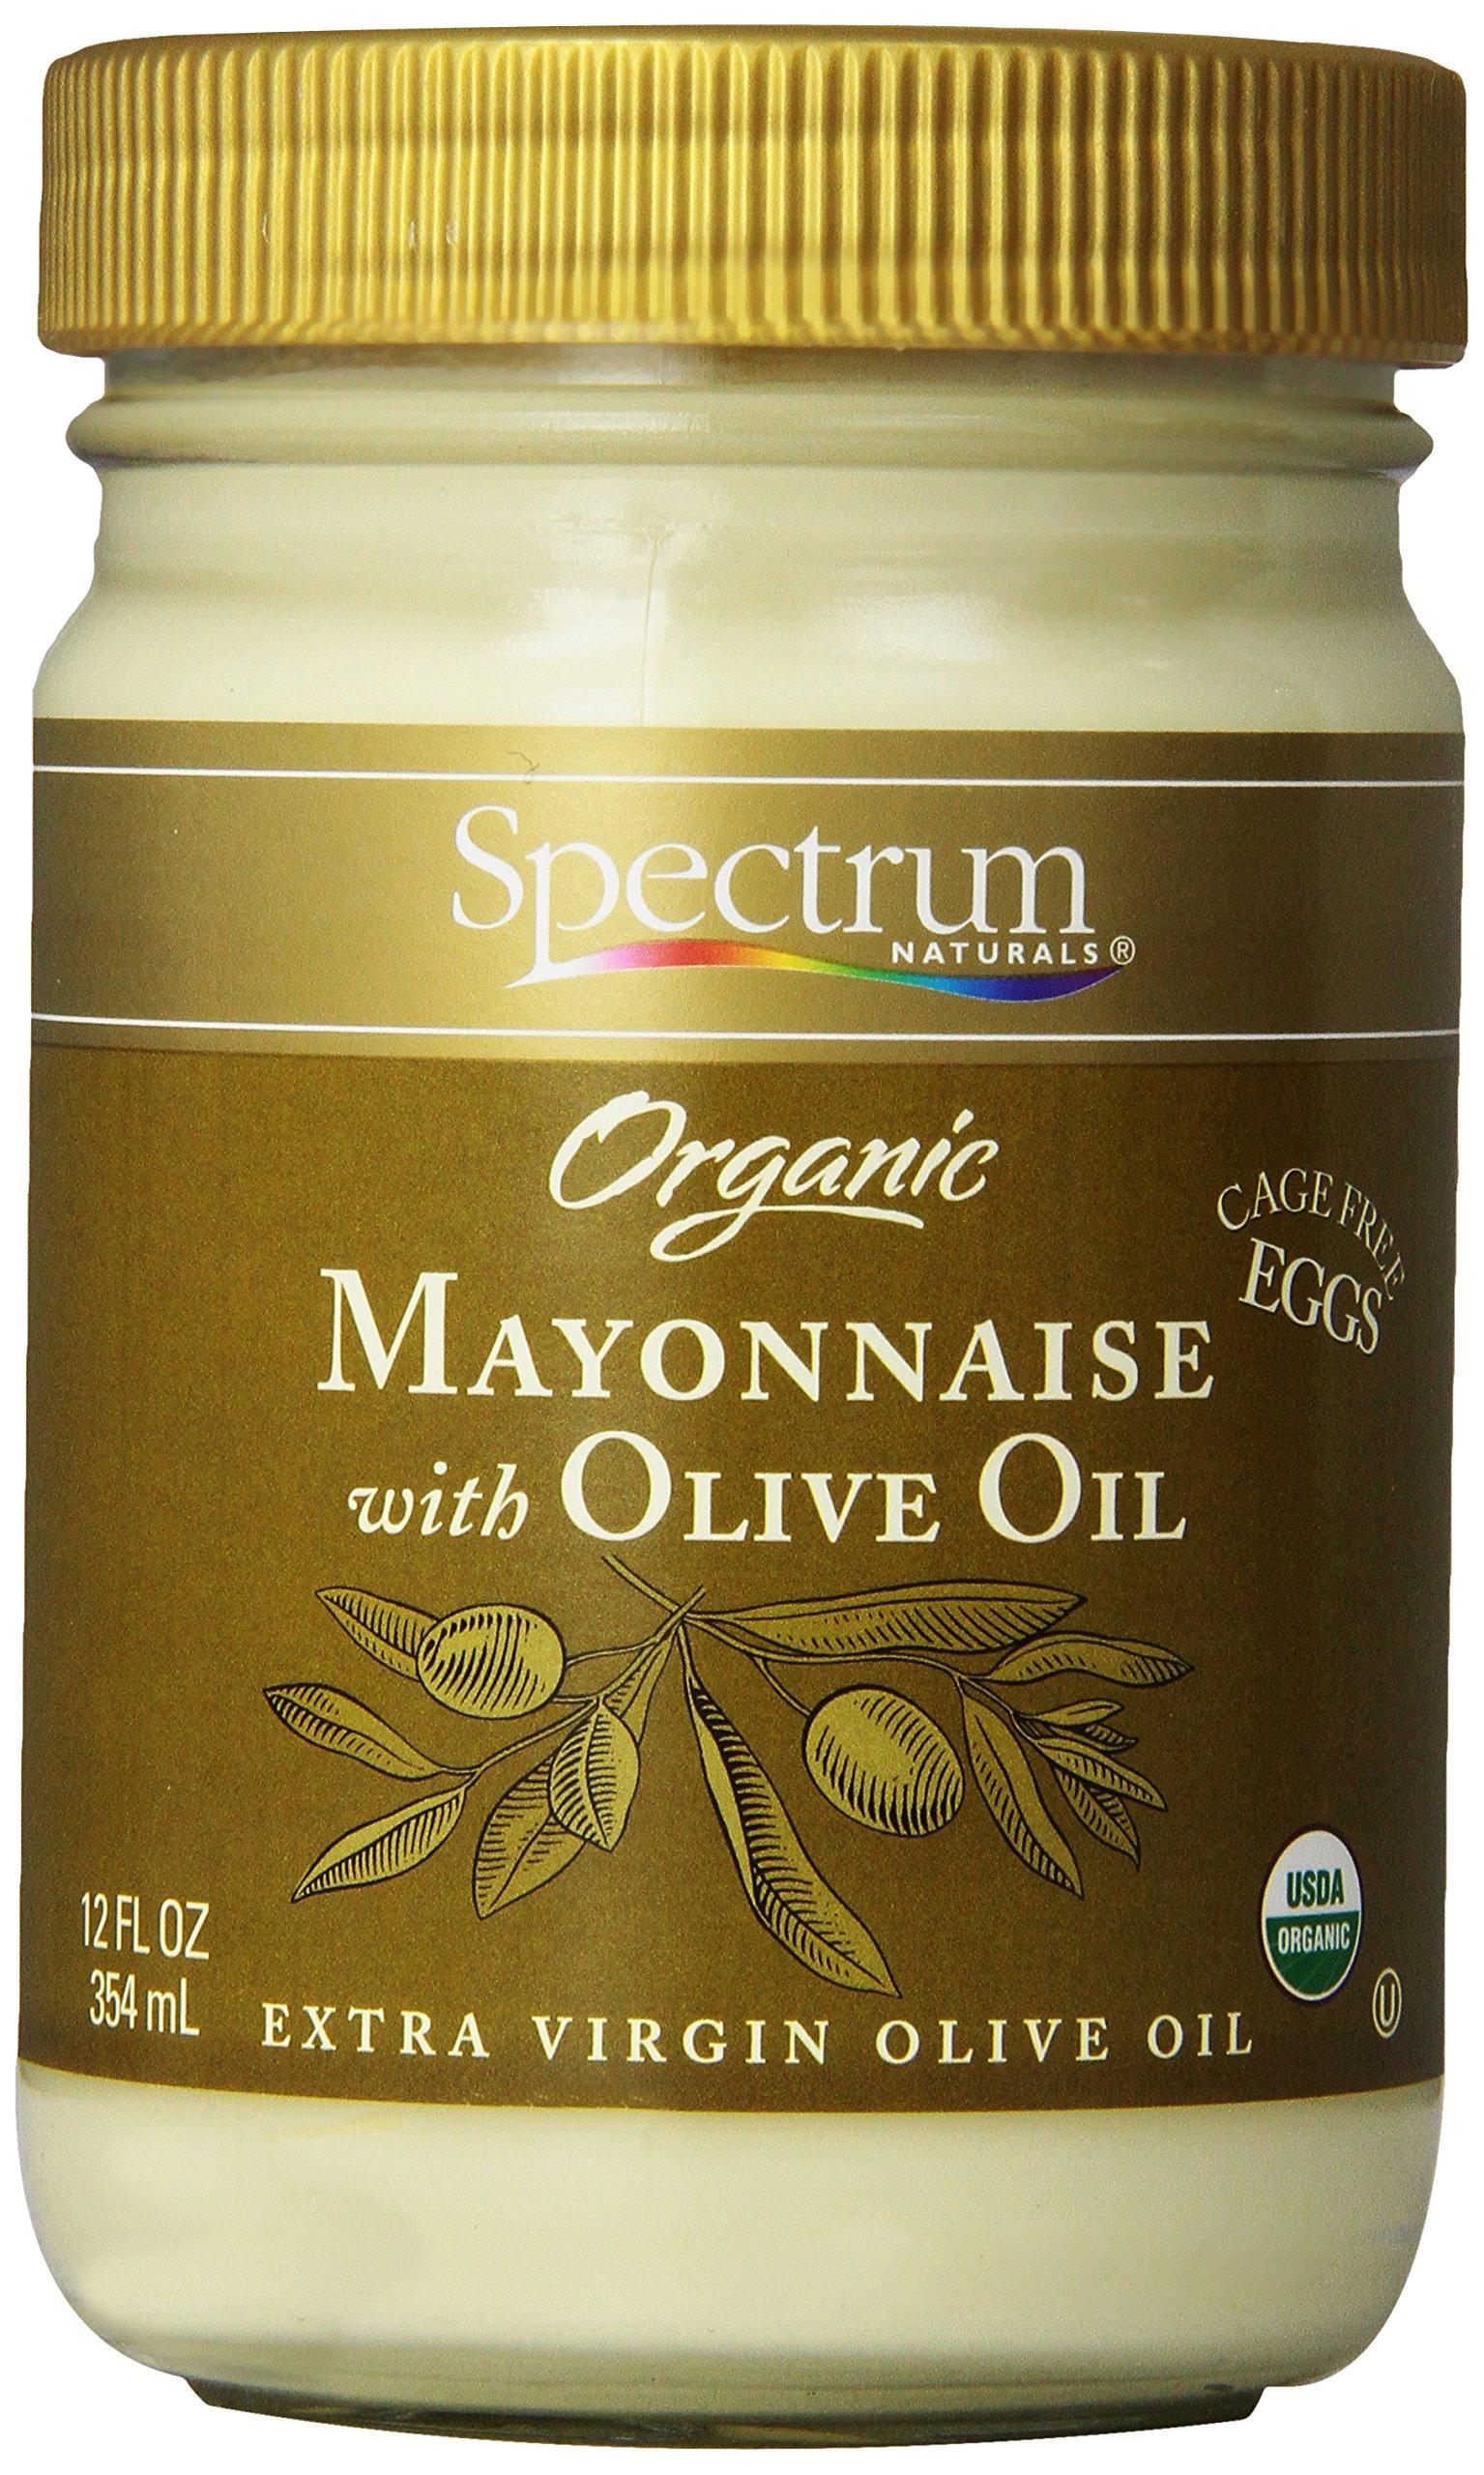 Spectrum Mayonnaise, Olive Oil, 12 oz